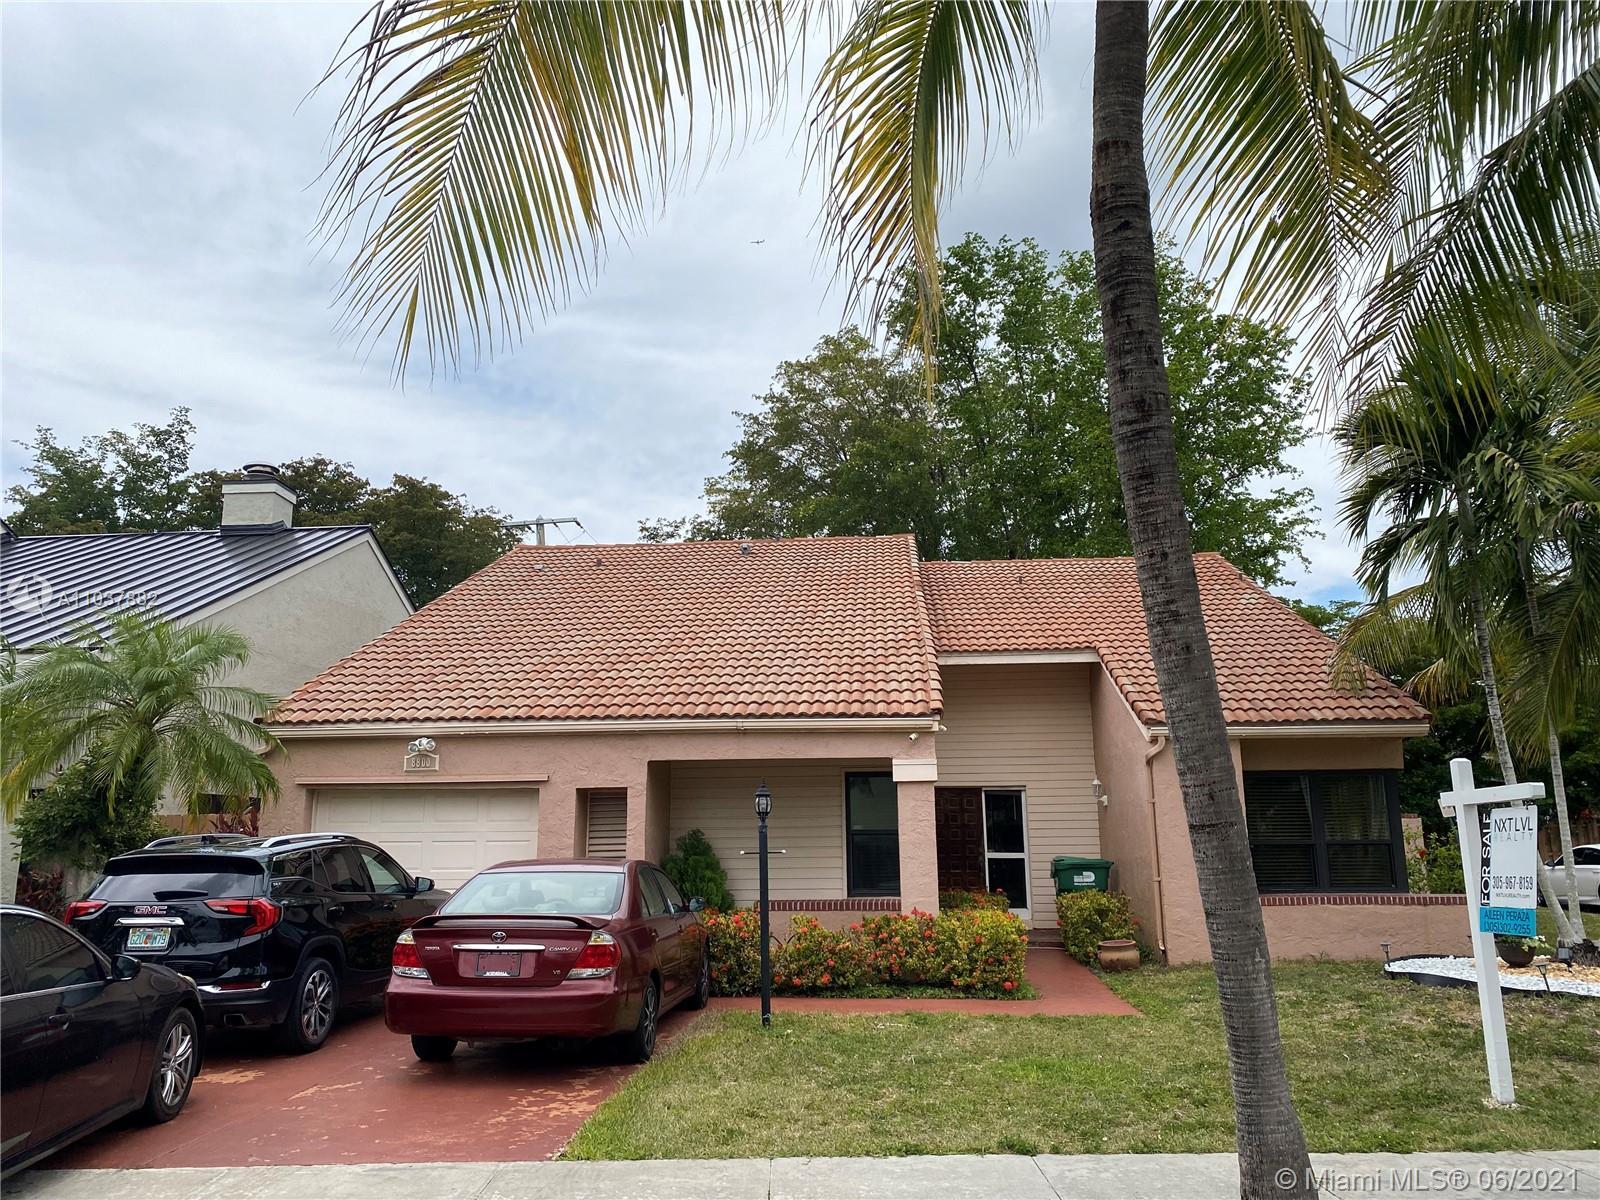 Hammocks - 8800 SW 150th Place Cir, Miami, FL 33196